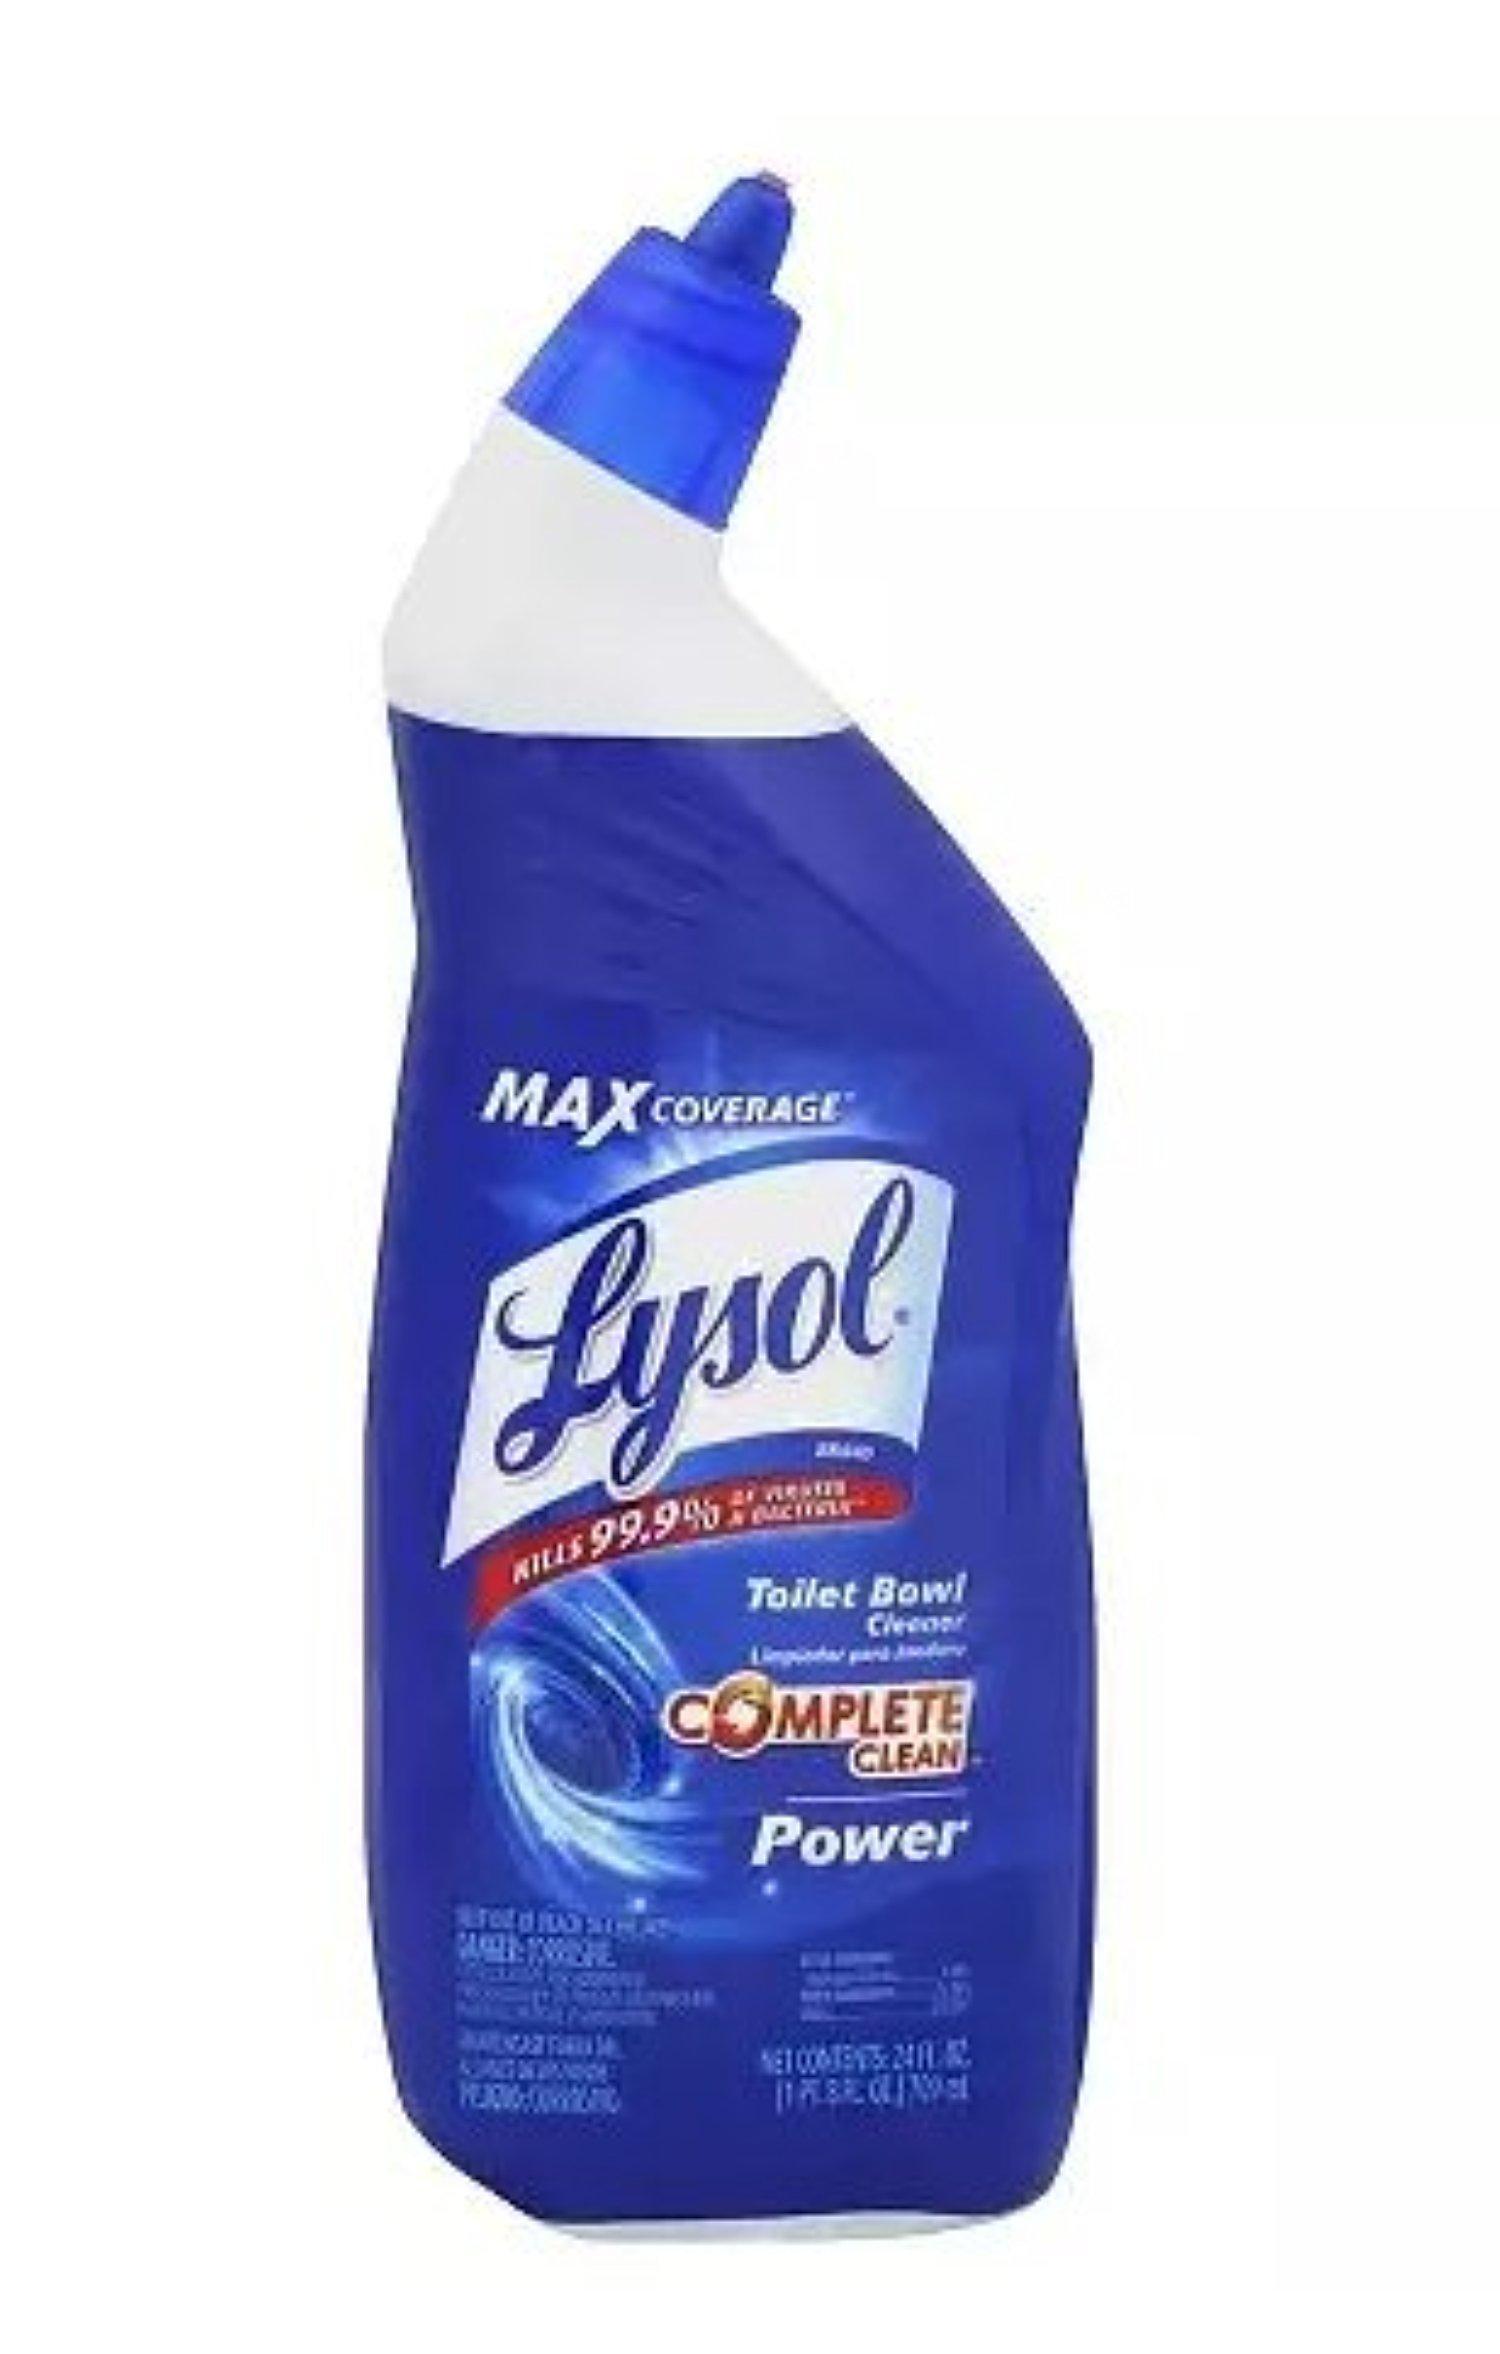 Lysol Toilet Bowl Cleaner, Original 24.0oz. Pack of 6